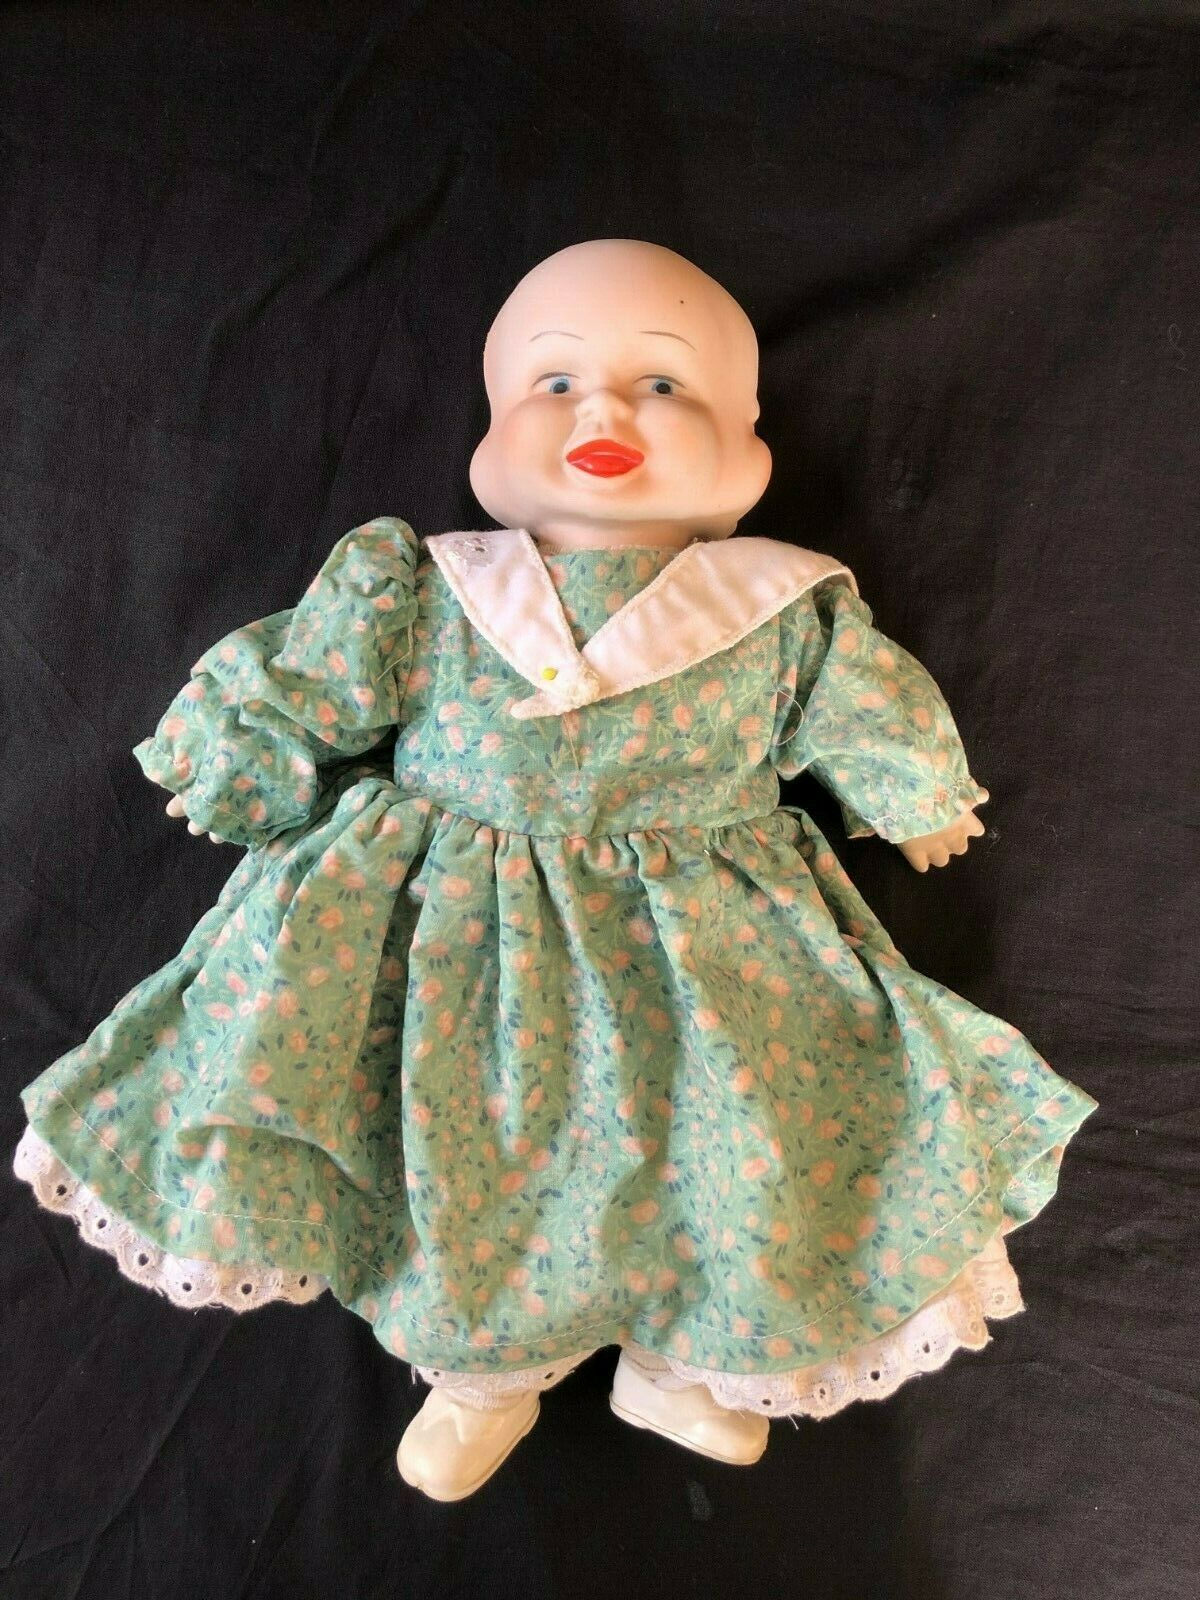 Vintage 3 Face Porcelain +  dressed  bambola (smile , cry , sleep )  ti aspetto